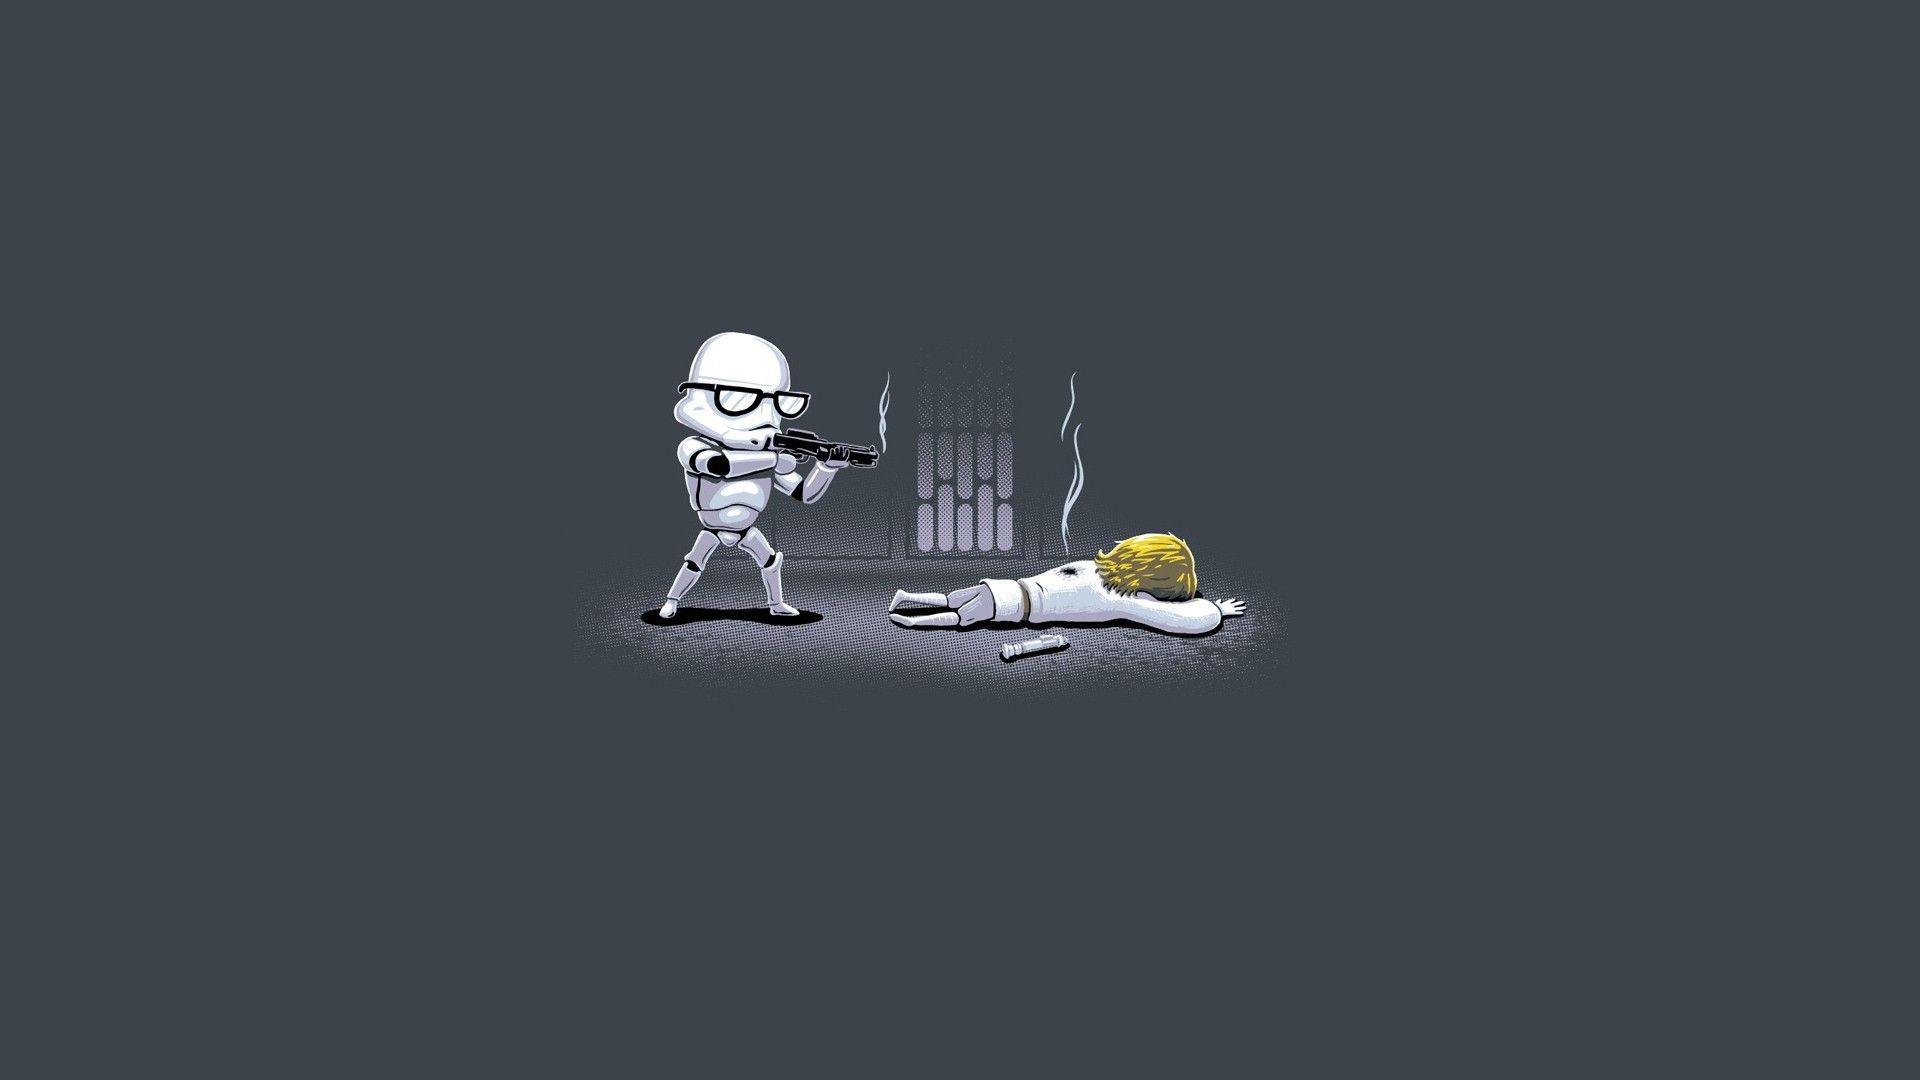 Storm Trooper With Glasses Star Wars Wallpaper Flash Wallpaper Hipster Wallpaper